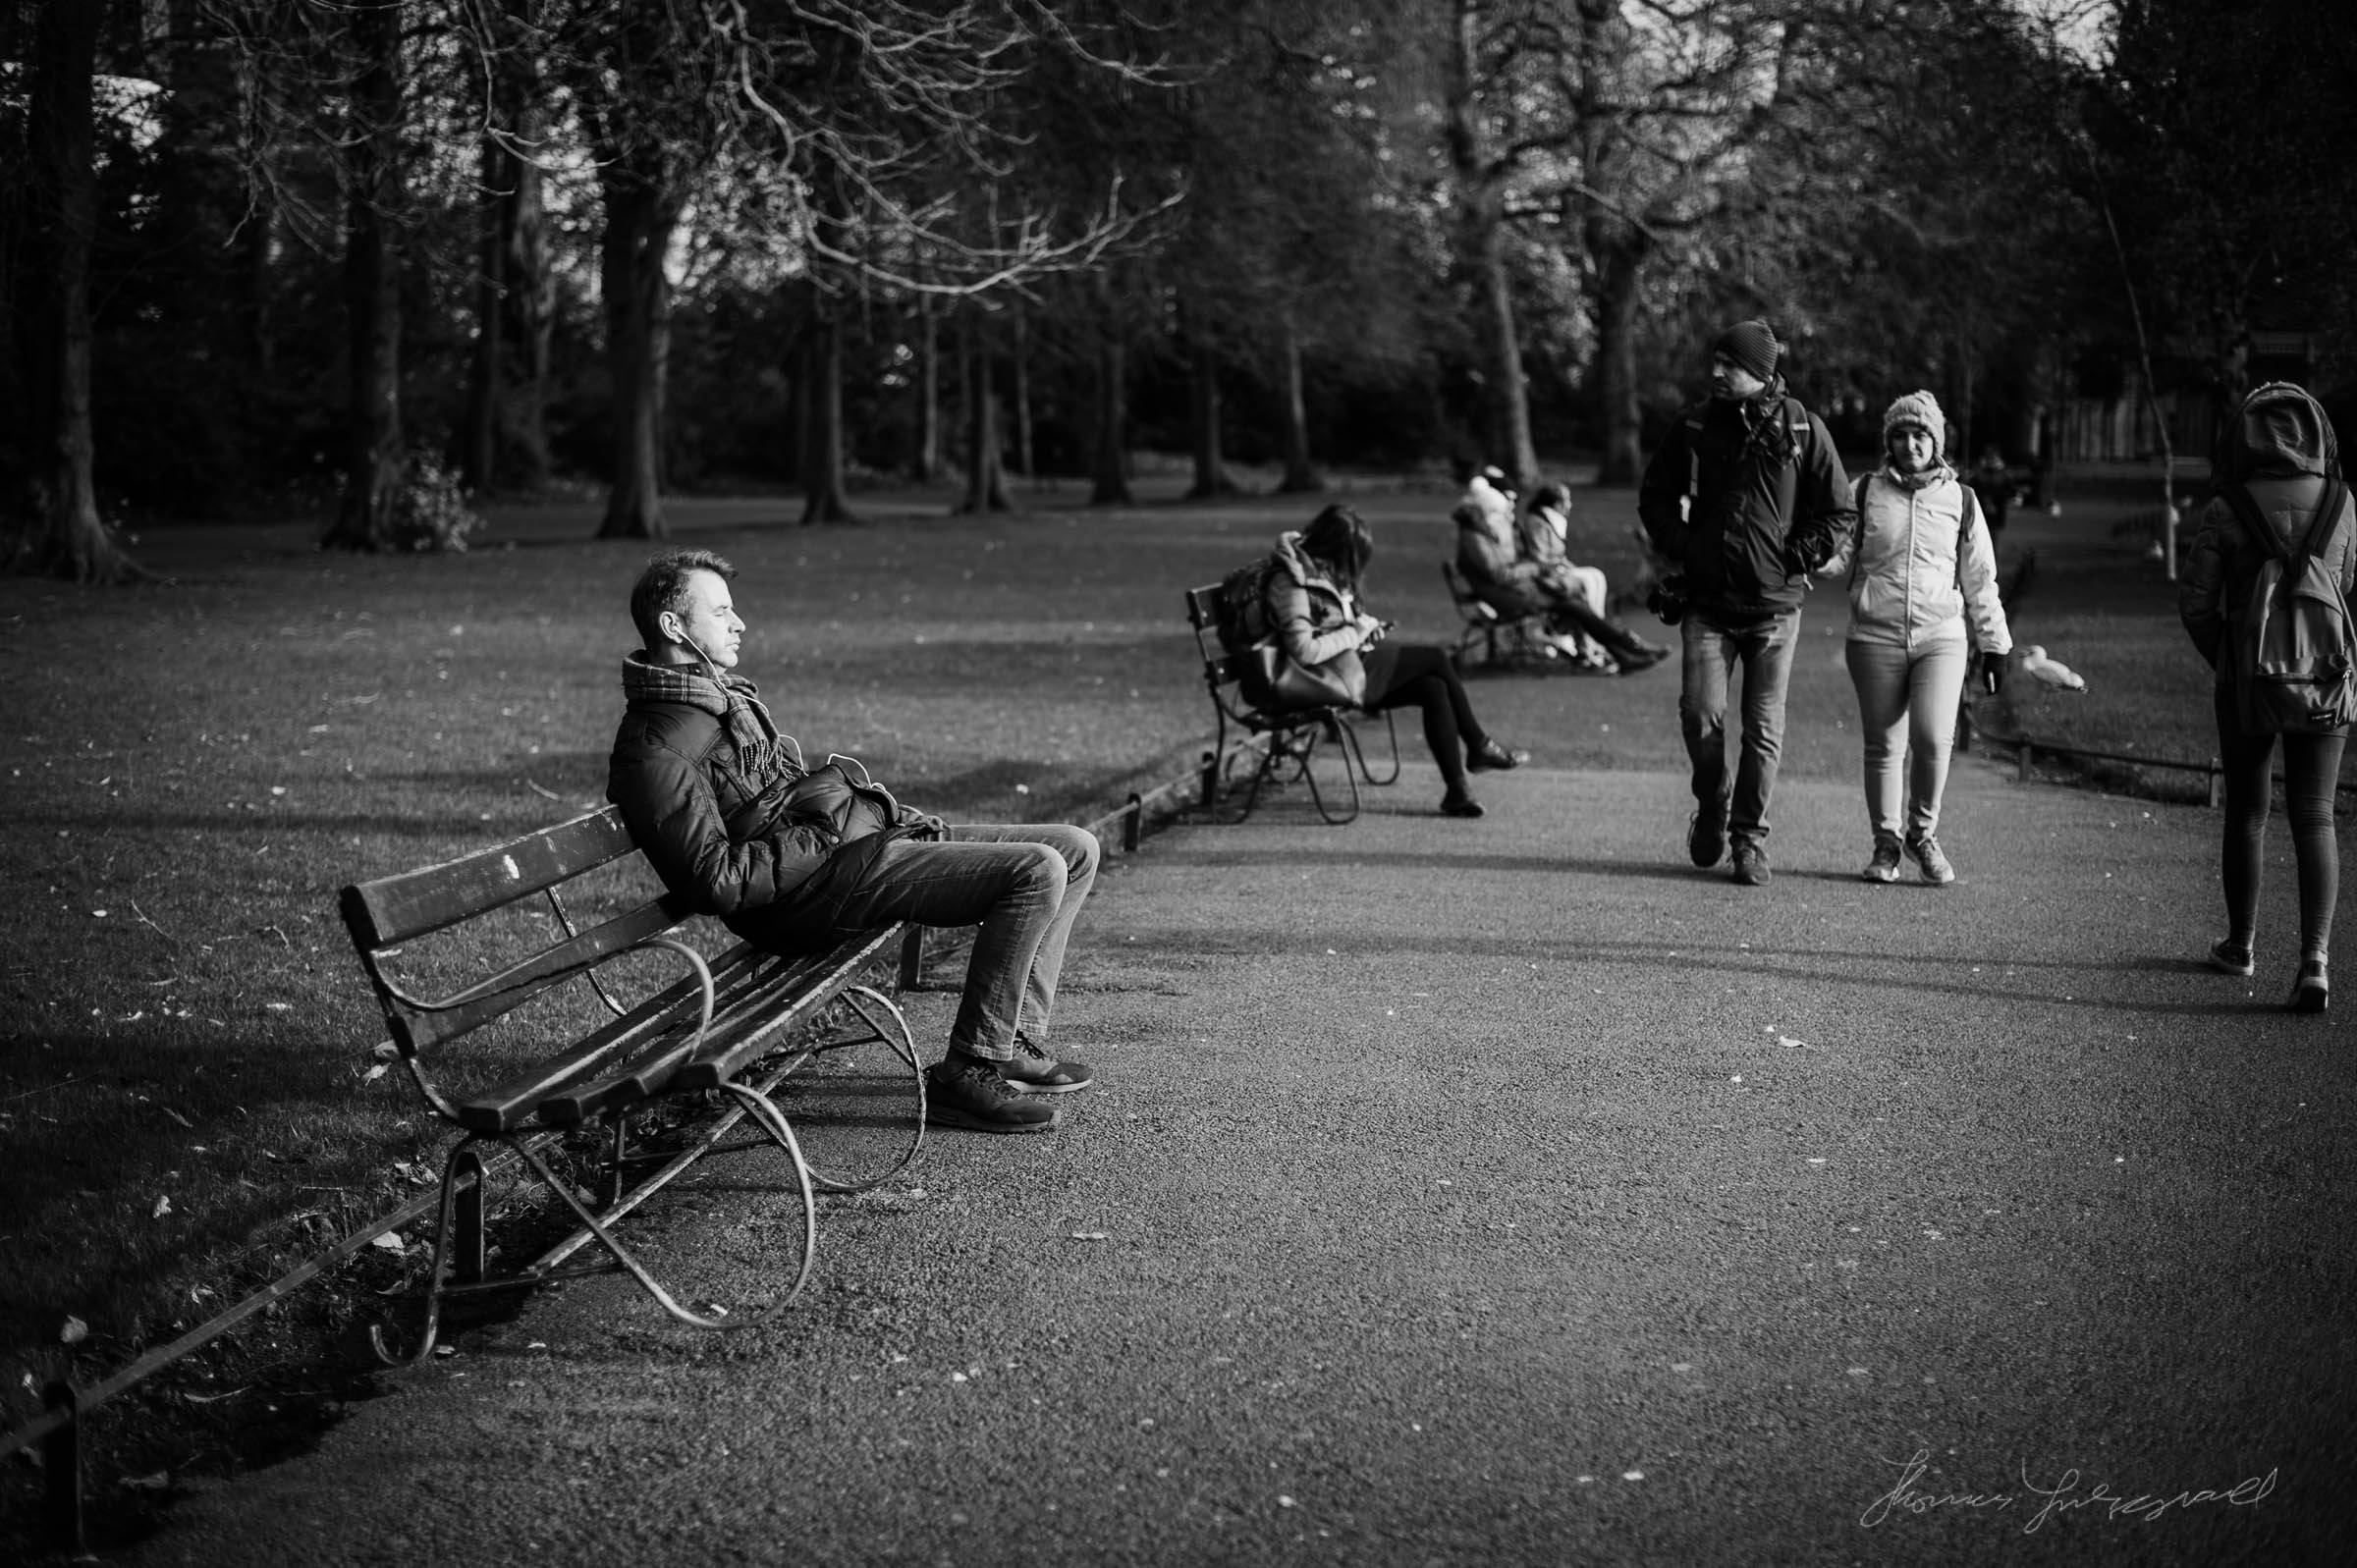 Street-photo-diary-eleven-12.jpg